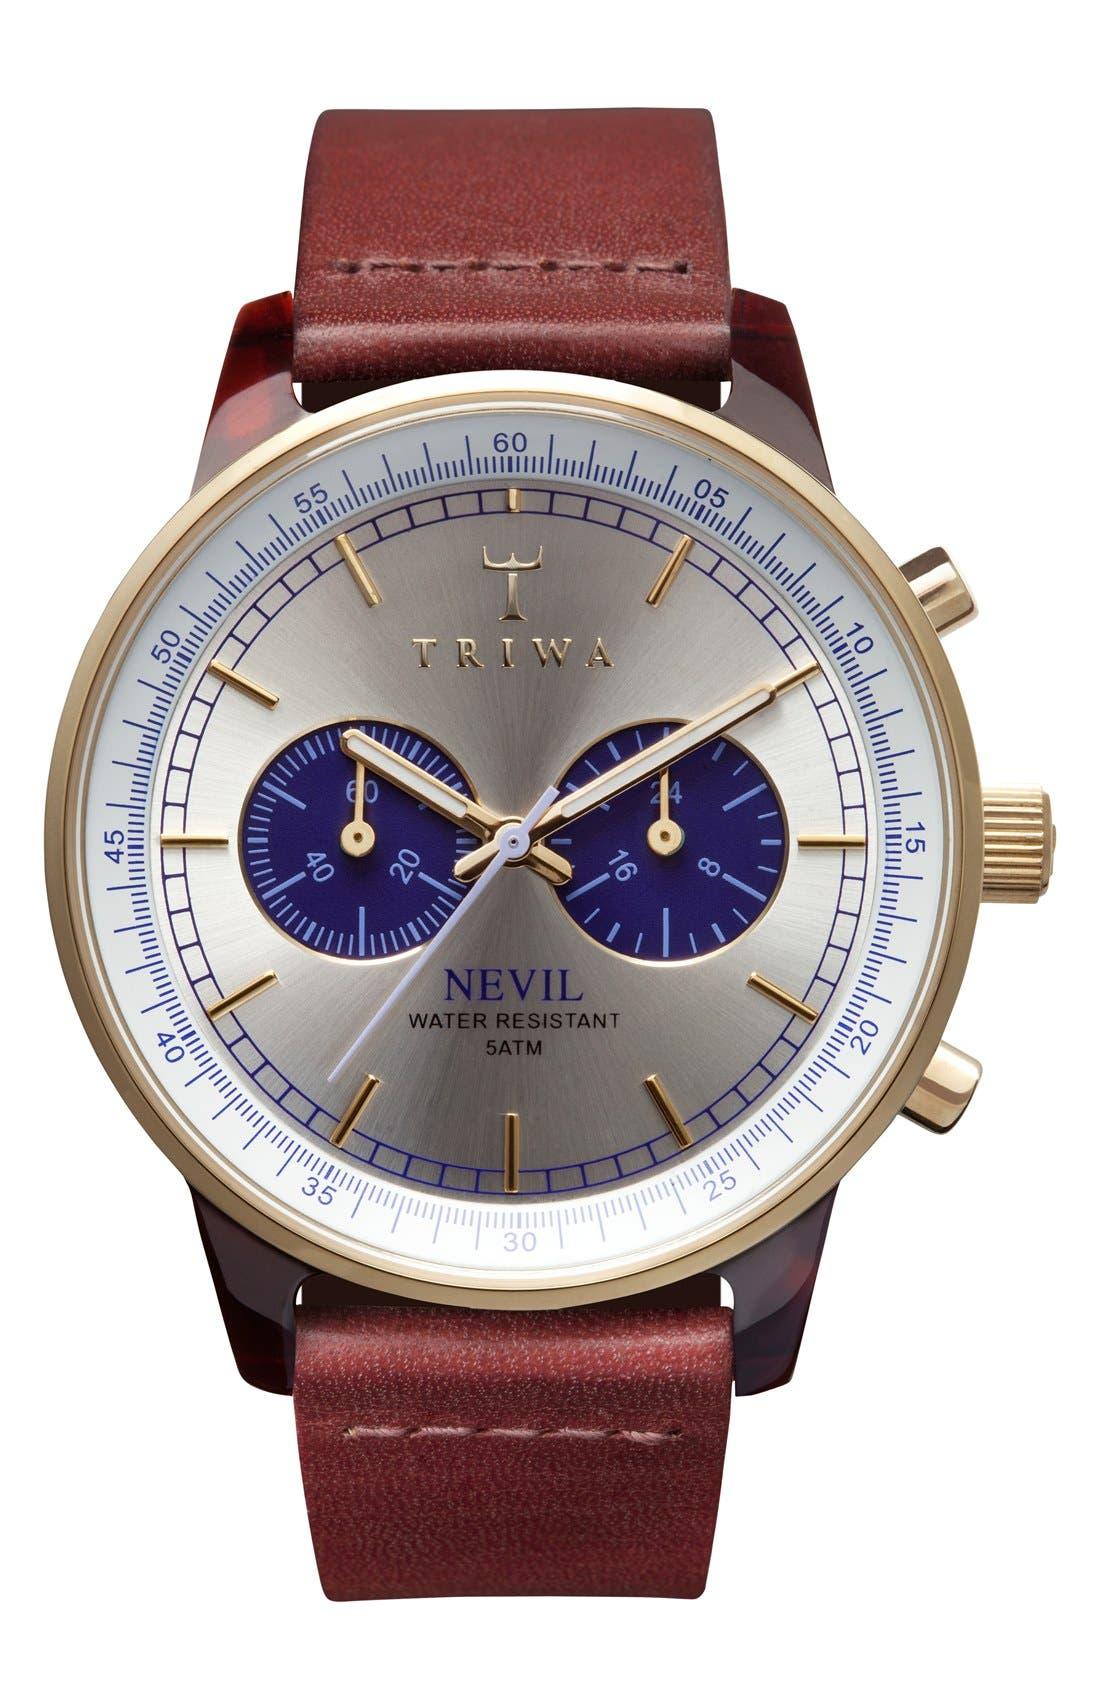 Main Image - Triwa 'Nevil' Chronograph Leather Strap Watch, 38mm